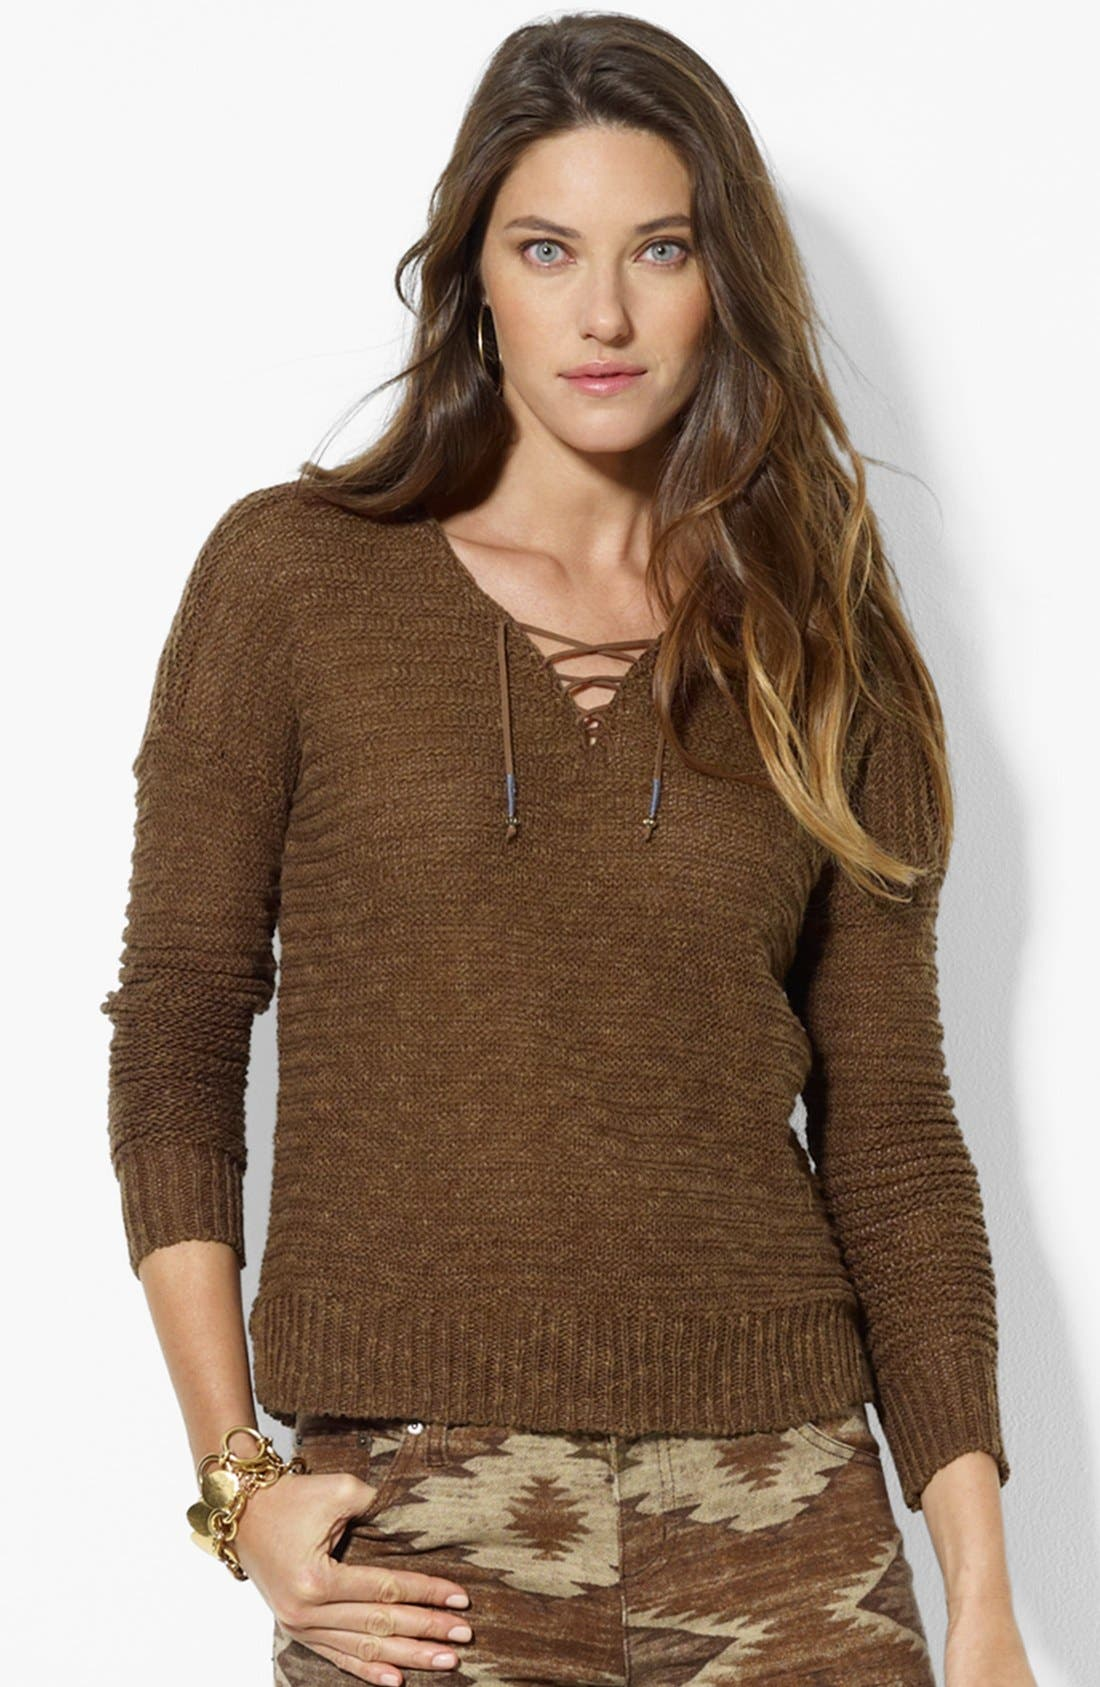 Alternate Image 1 Selected - Lauren Ralph Lauren Lace-Up Rib Knit Sweater